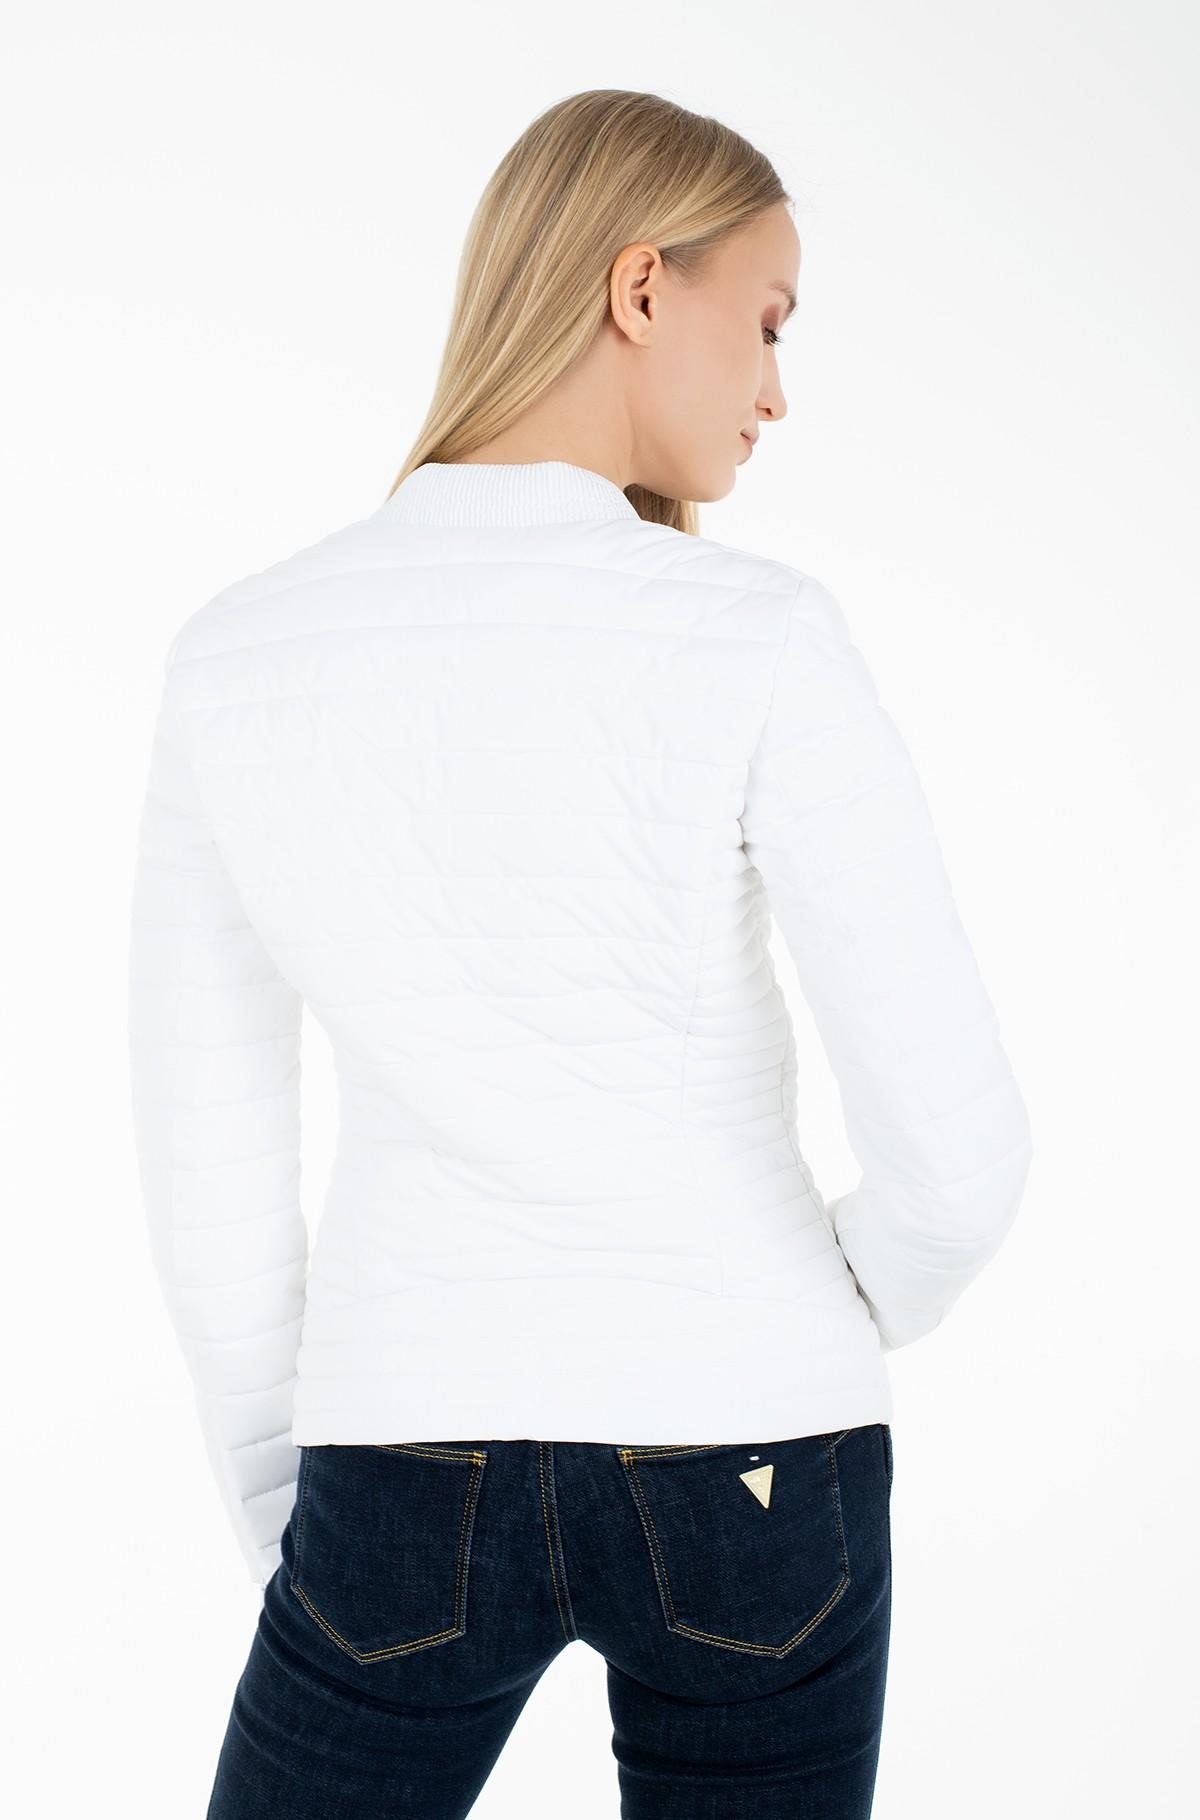 Jacket W1RL52 WCOG0 -full-3